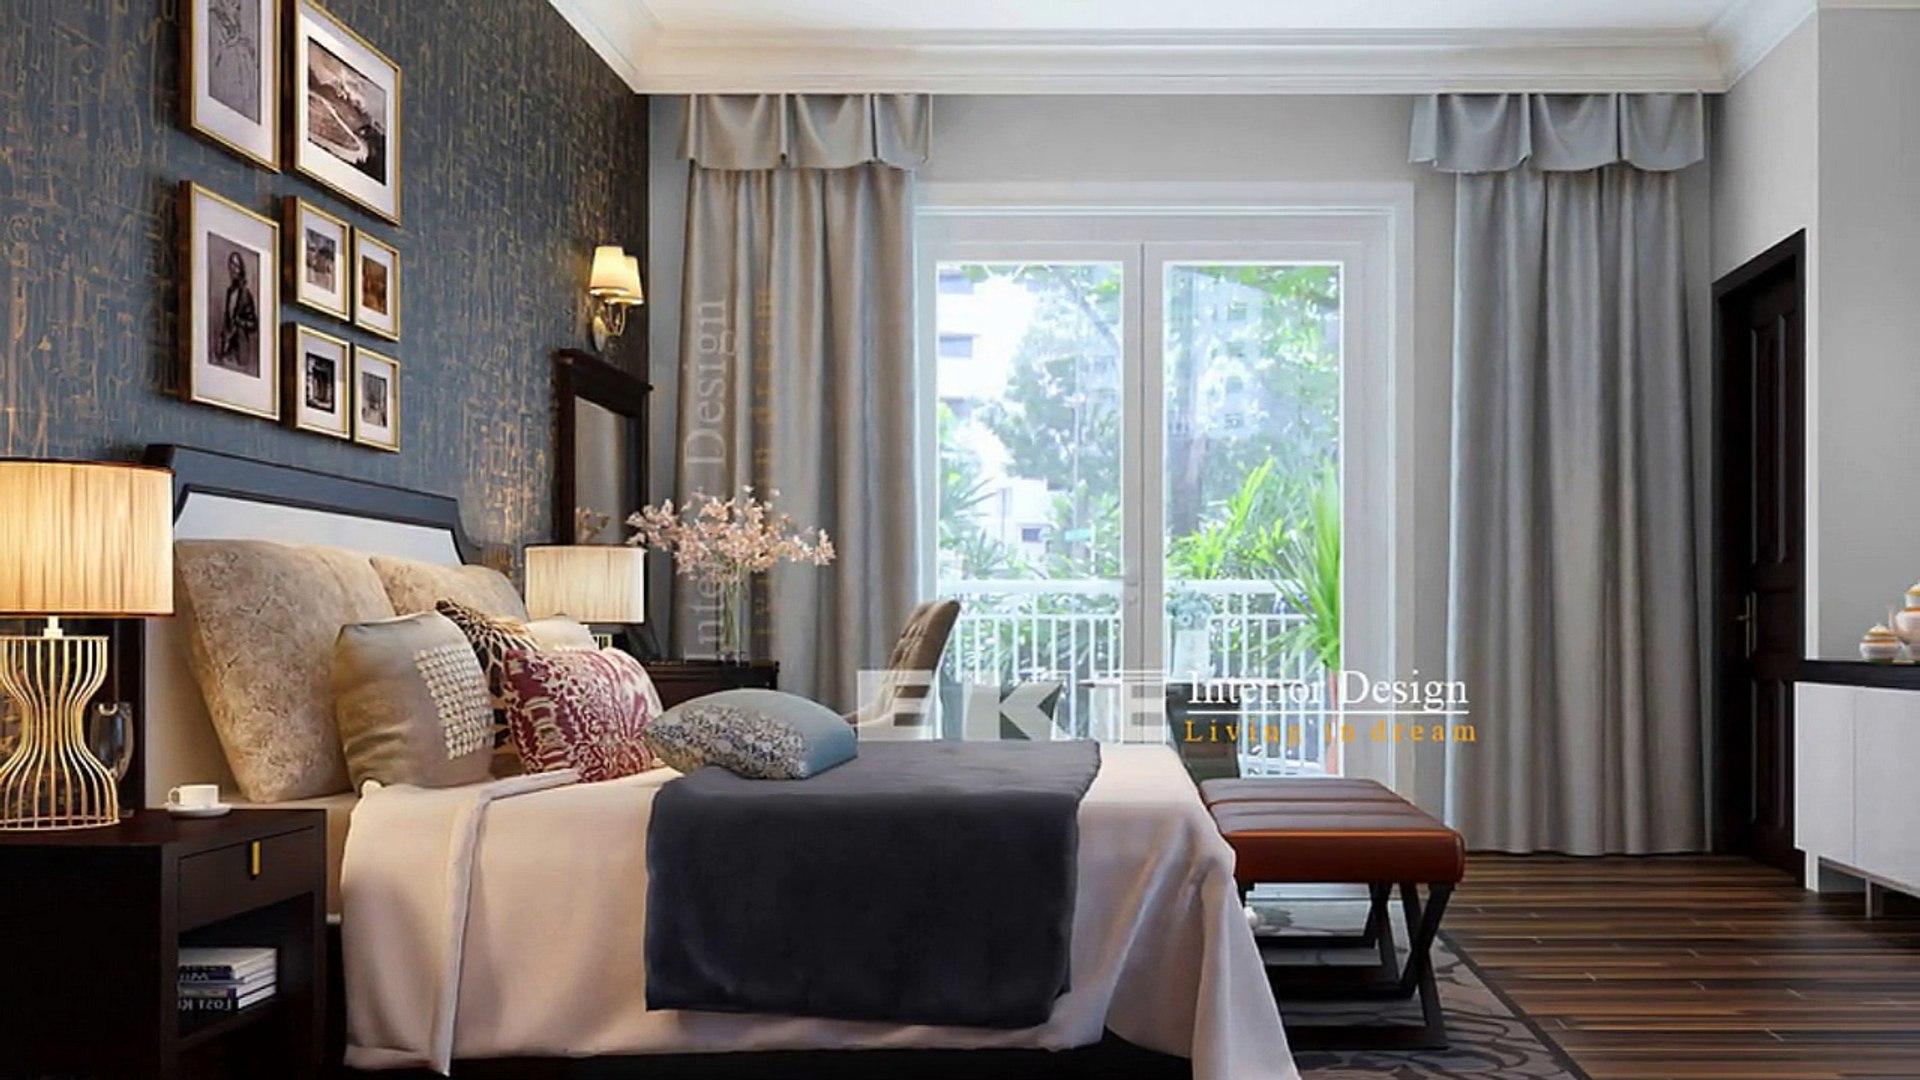 Wooden Floor Bedroom Interior Ideas - Video Dailymotion